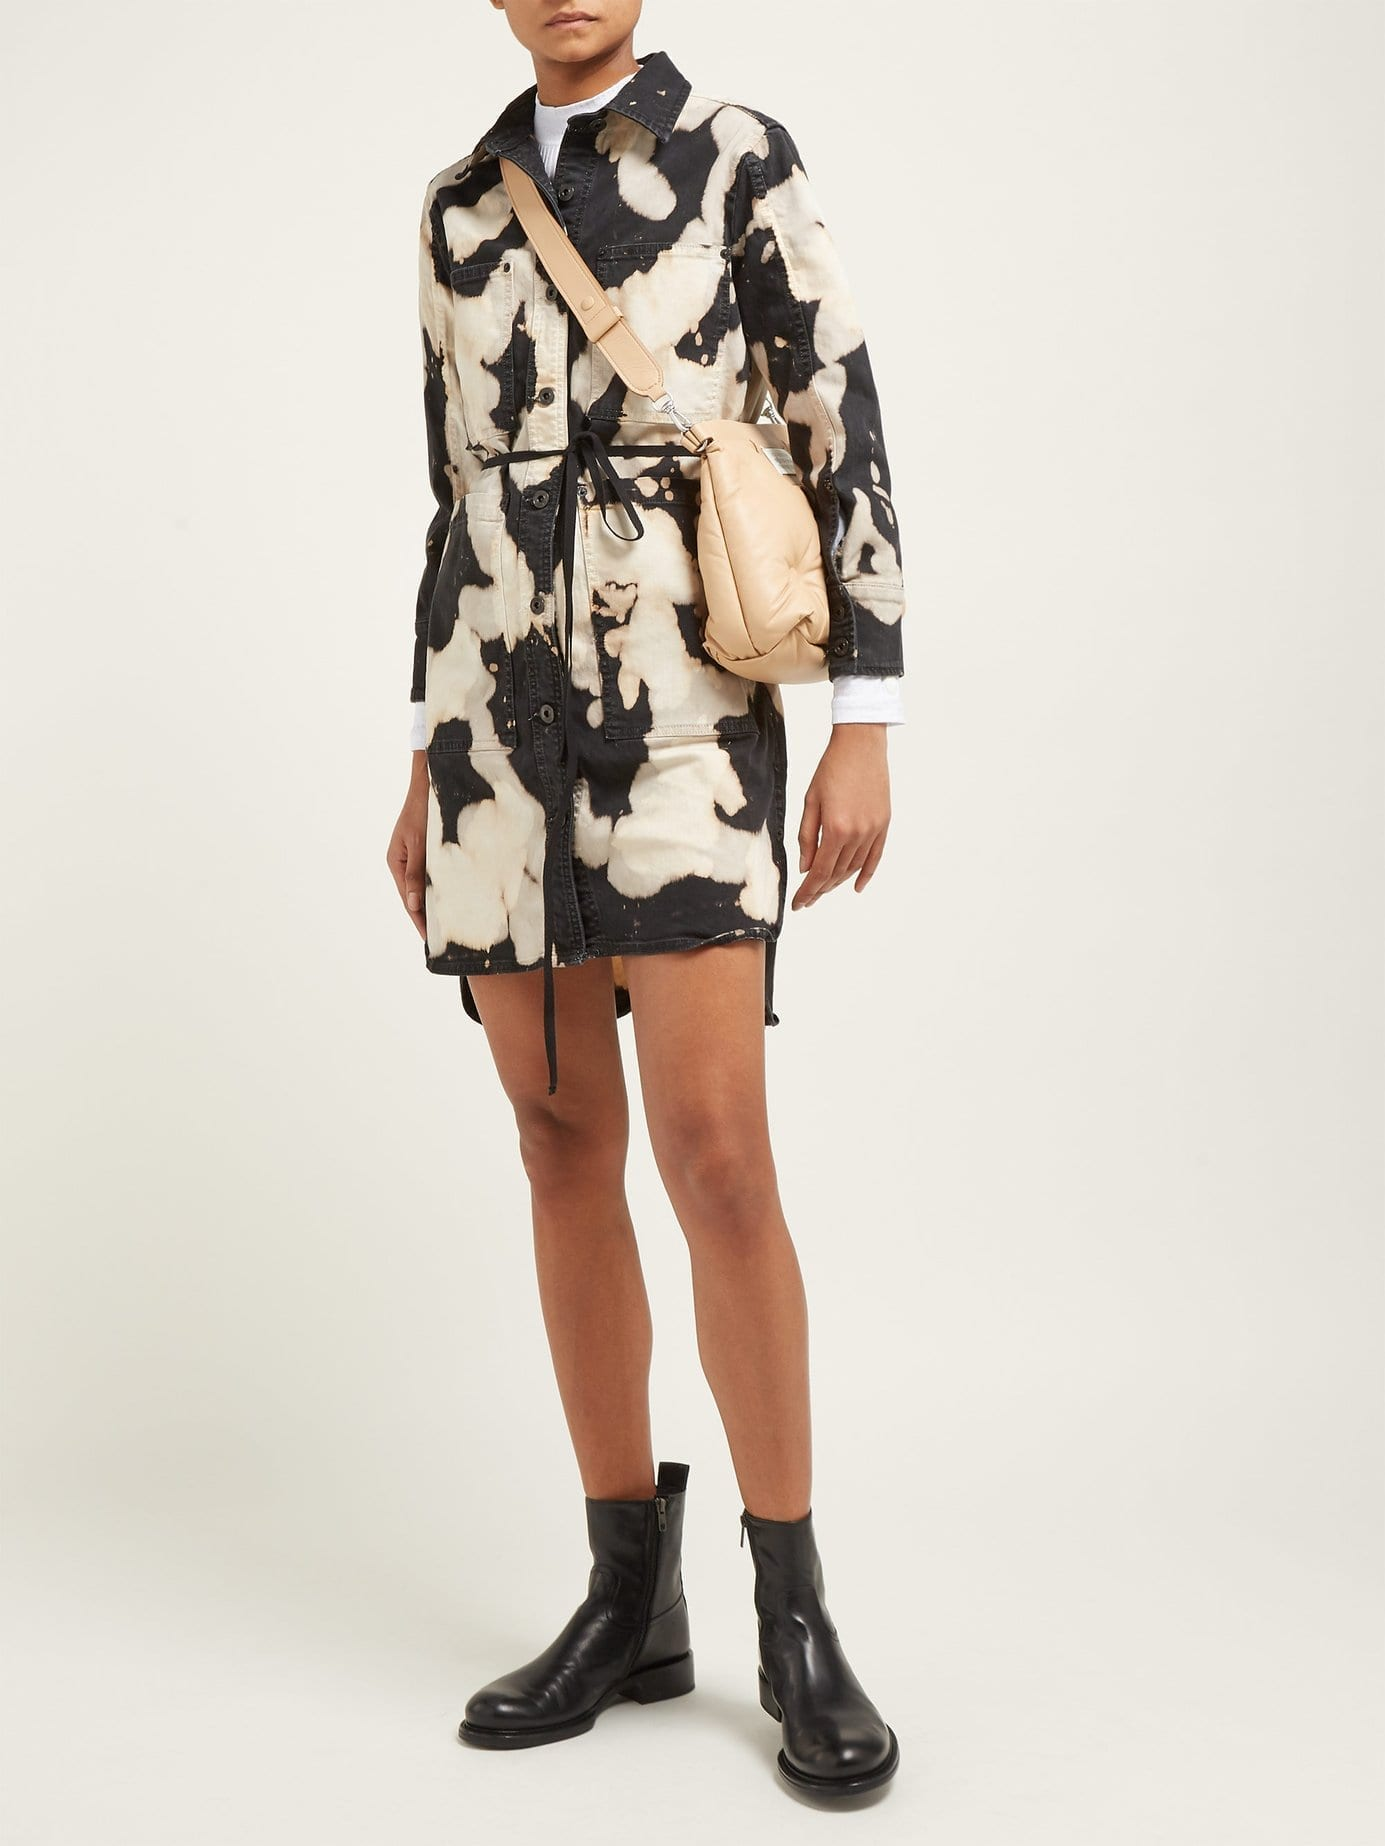 PROENZA SCHOULER PSWL Tie-dye-effect Denim Shirt Black Dress